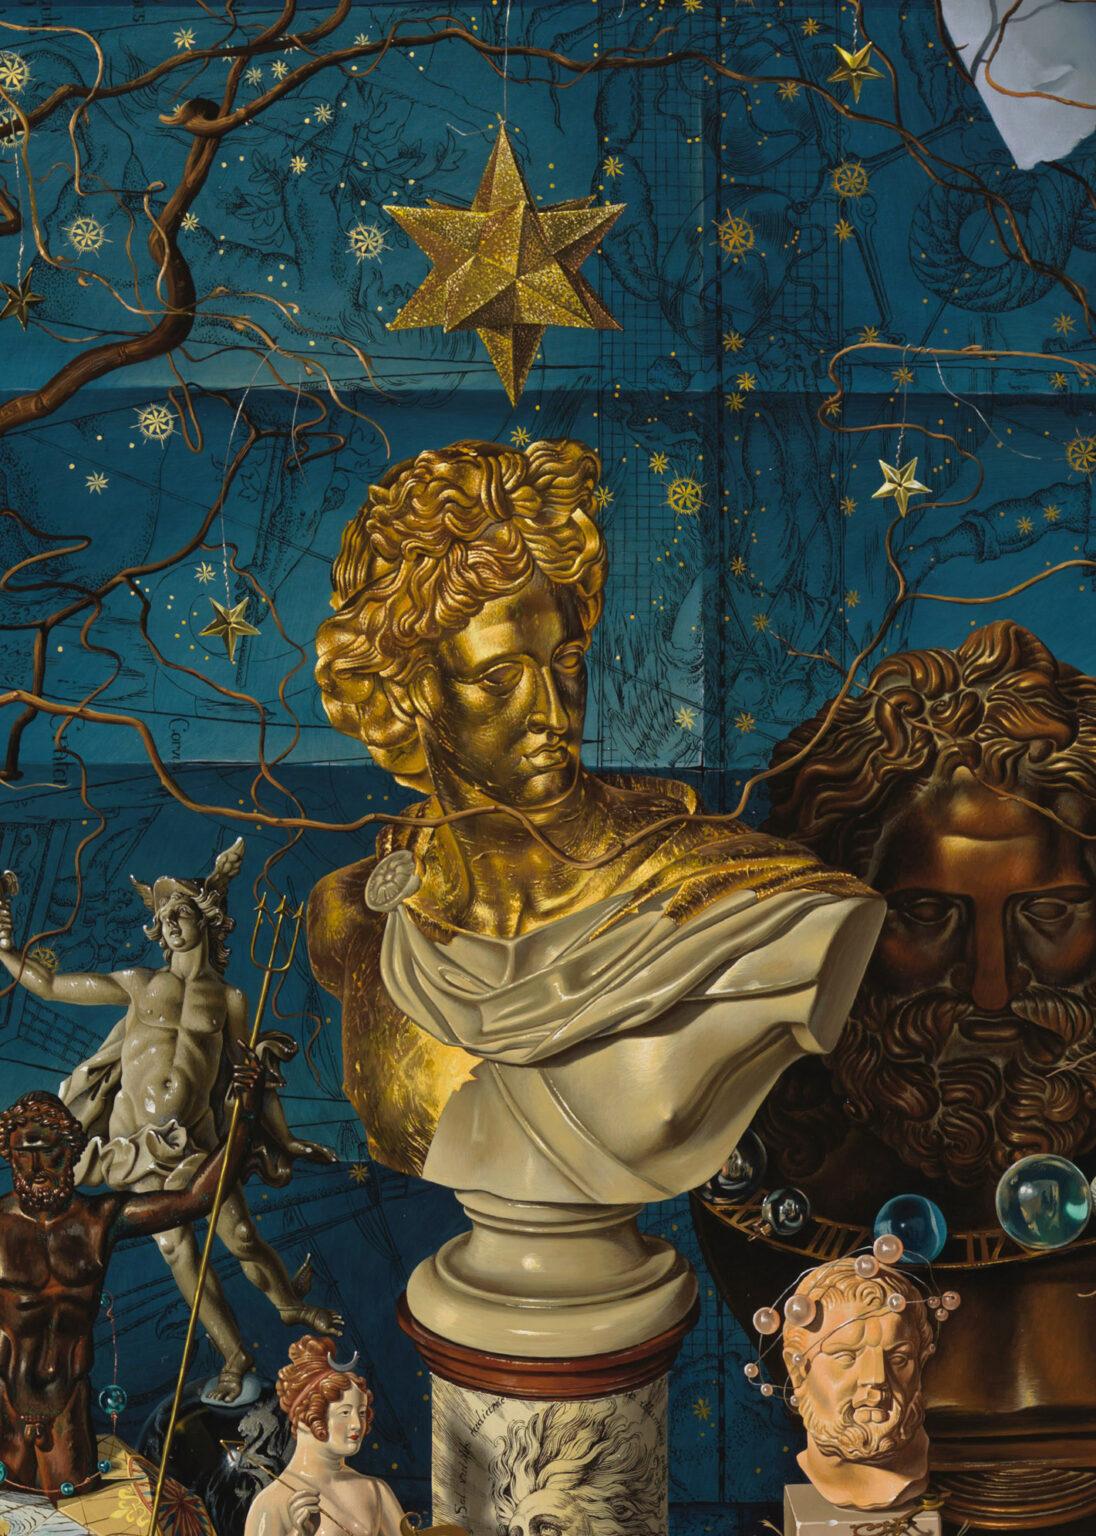 THE-HEAVENS-giclee-print-detail 2-Miriam-Escofet